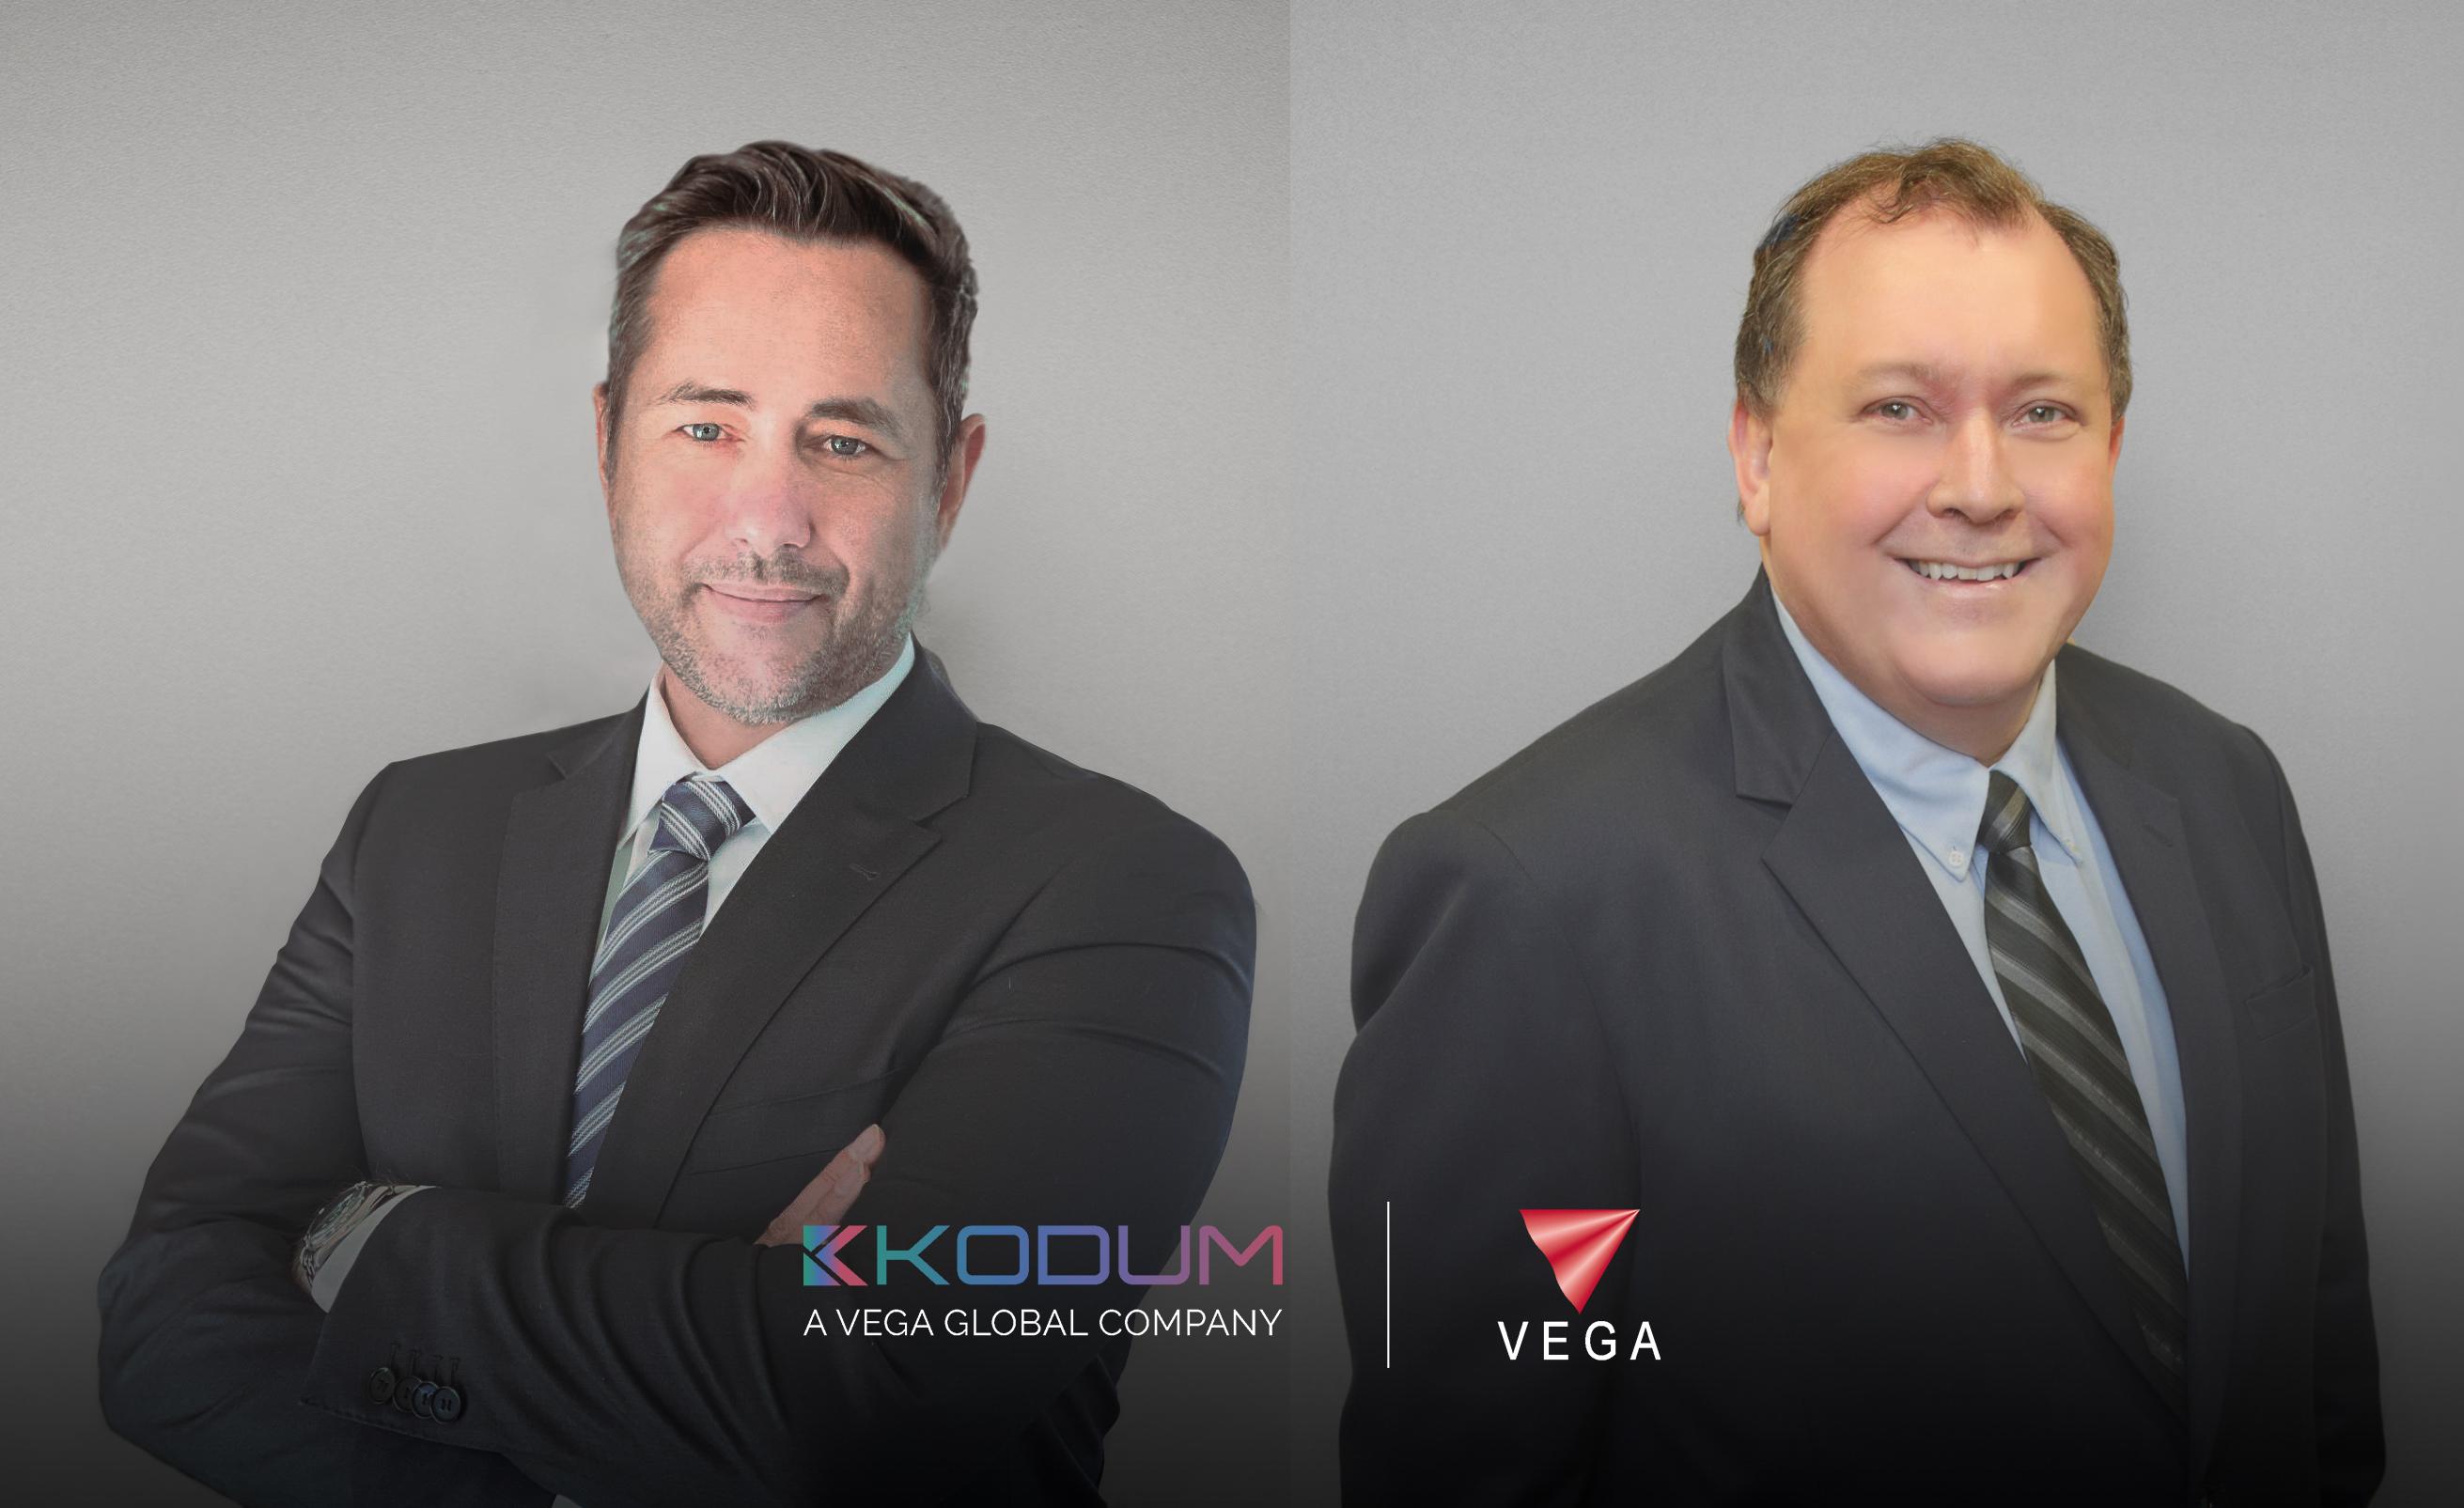 Vega GlobalがKodum社に出資、APACのAV/ITシステム・インテグレーション能力を強化